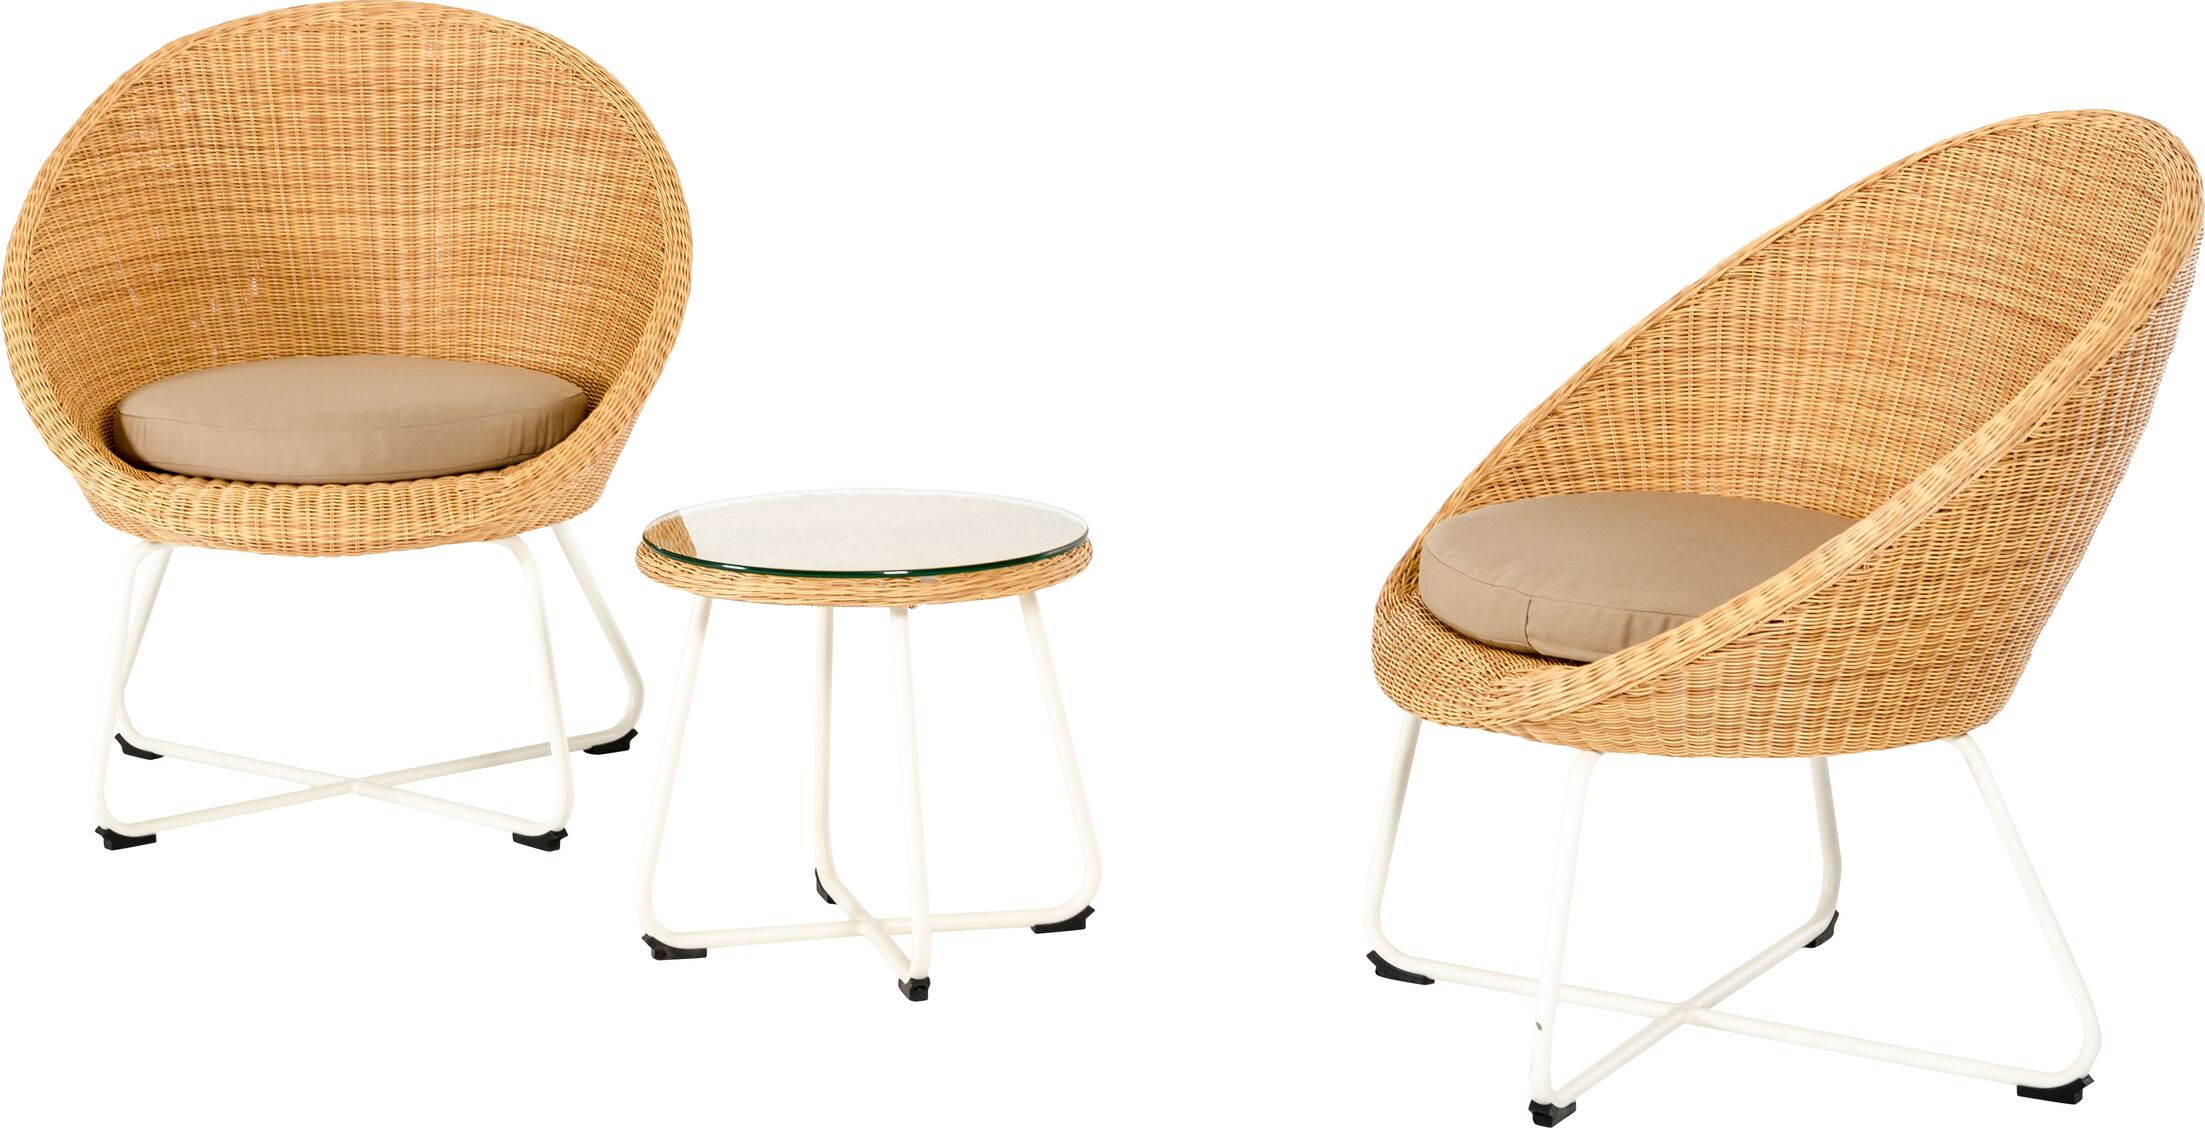 Markowitz 3 Piece Conversation Set with Cushions